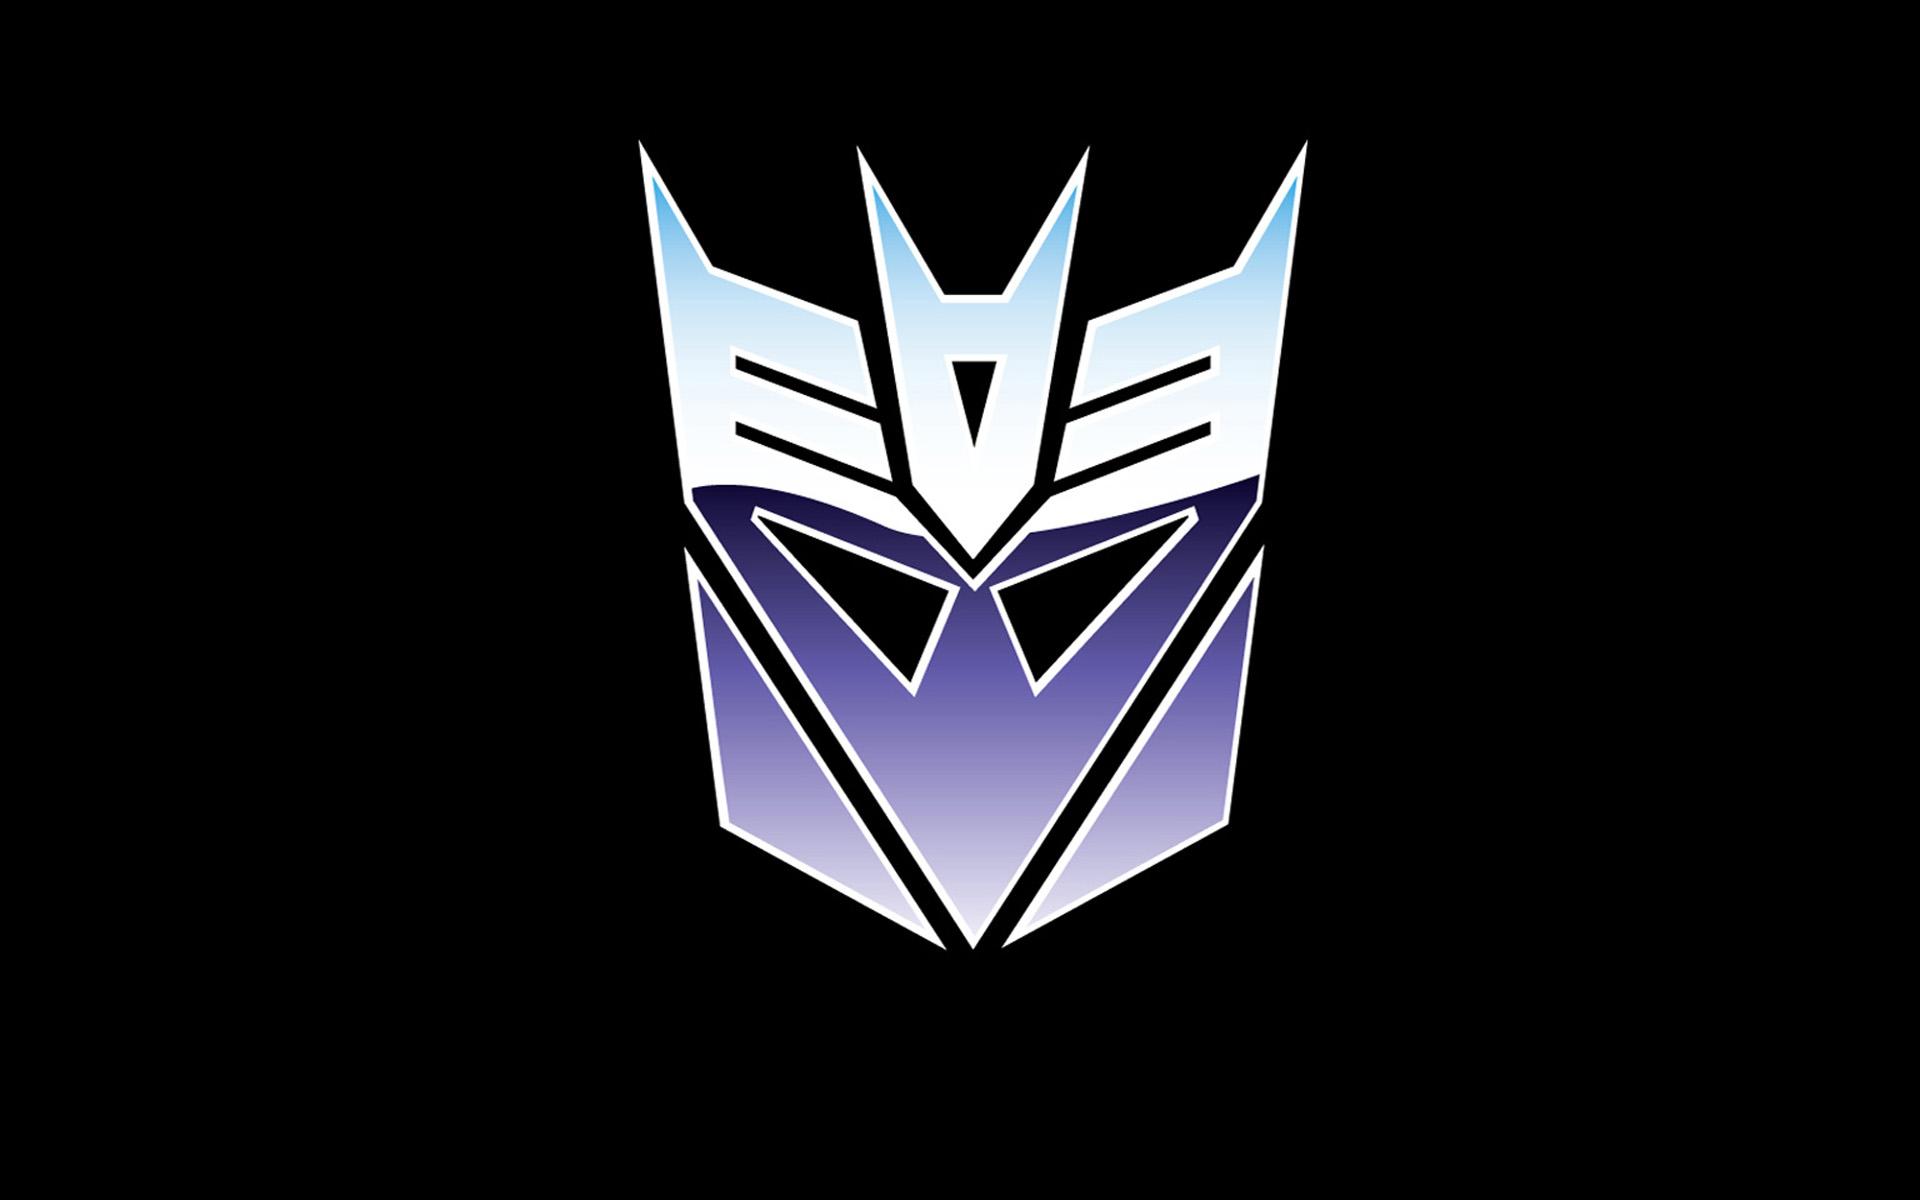 Transformers Logo Decepticons wallpaper 66552 1920x1200